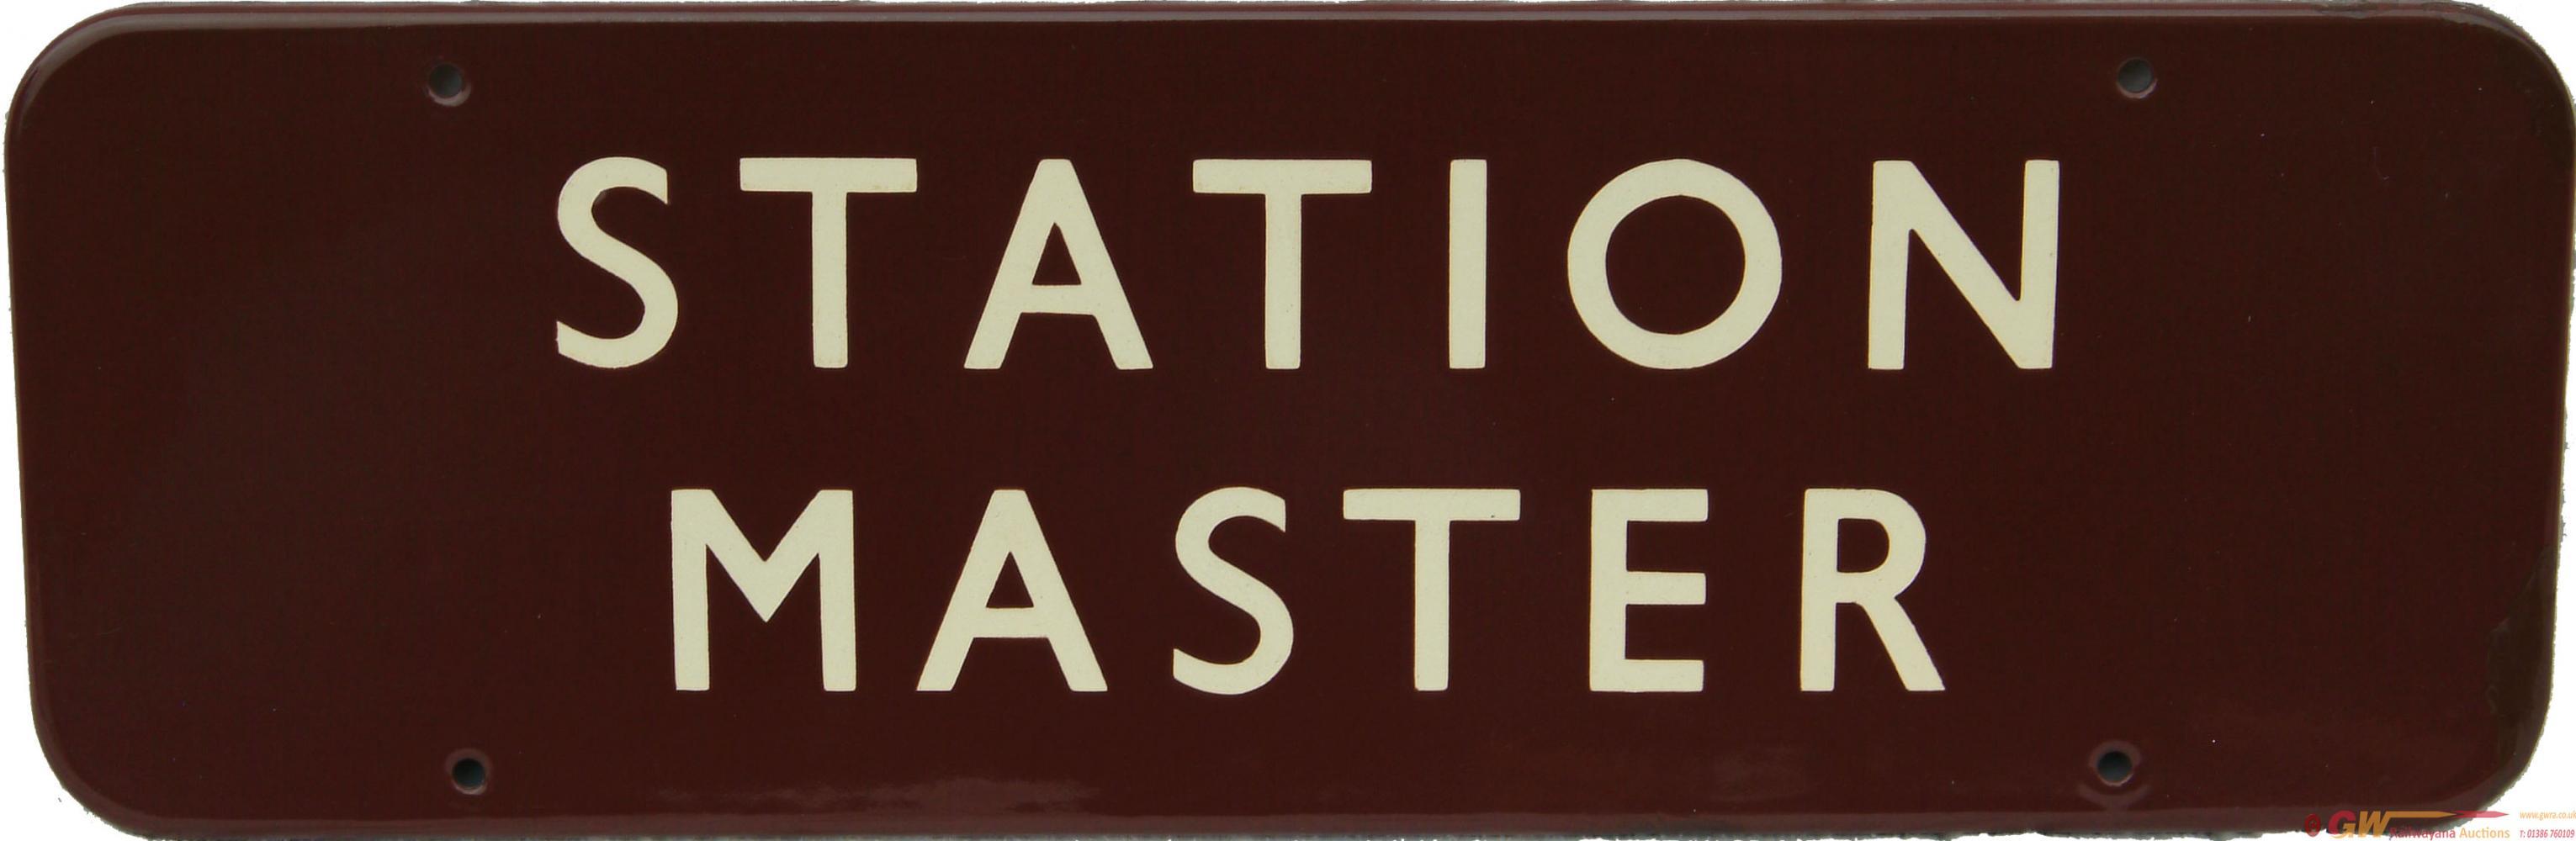 Doorplate, BR(W)  STATION MASTER, F/F. Enamel